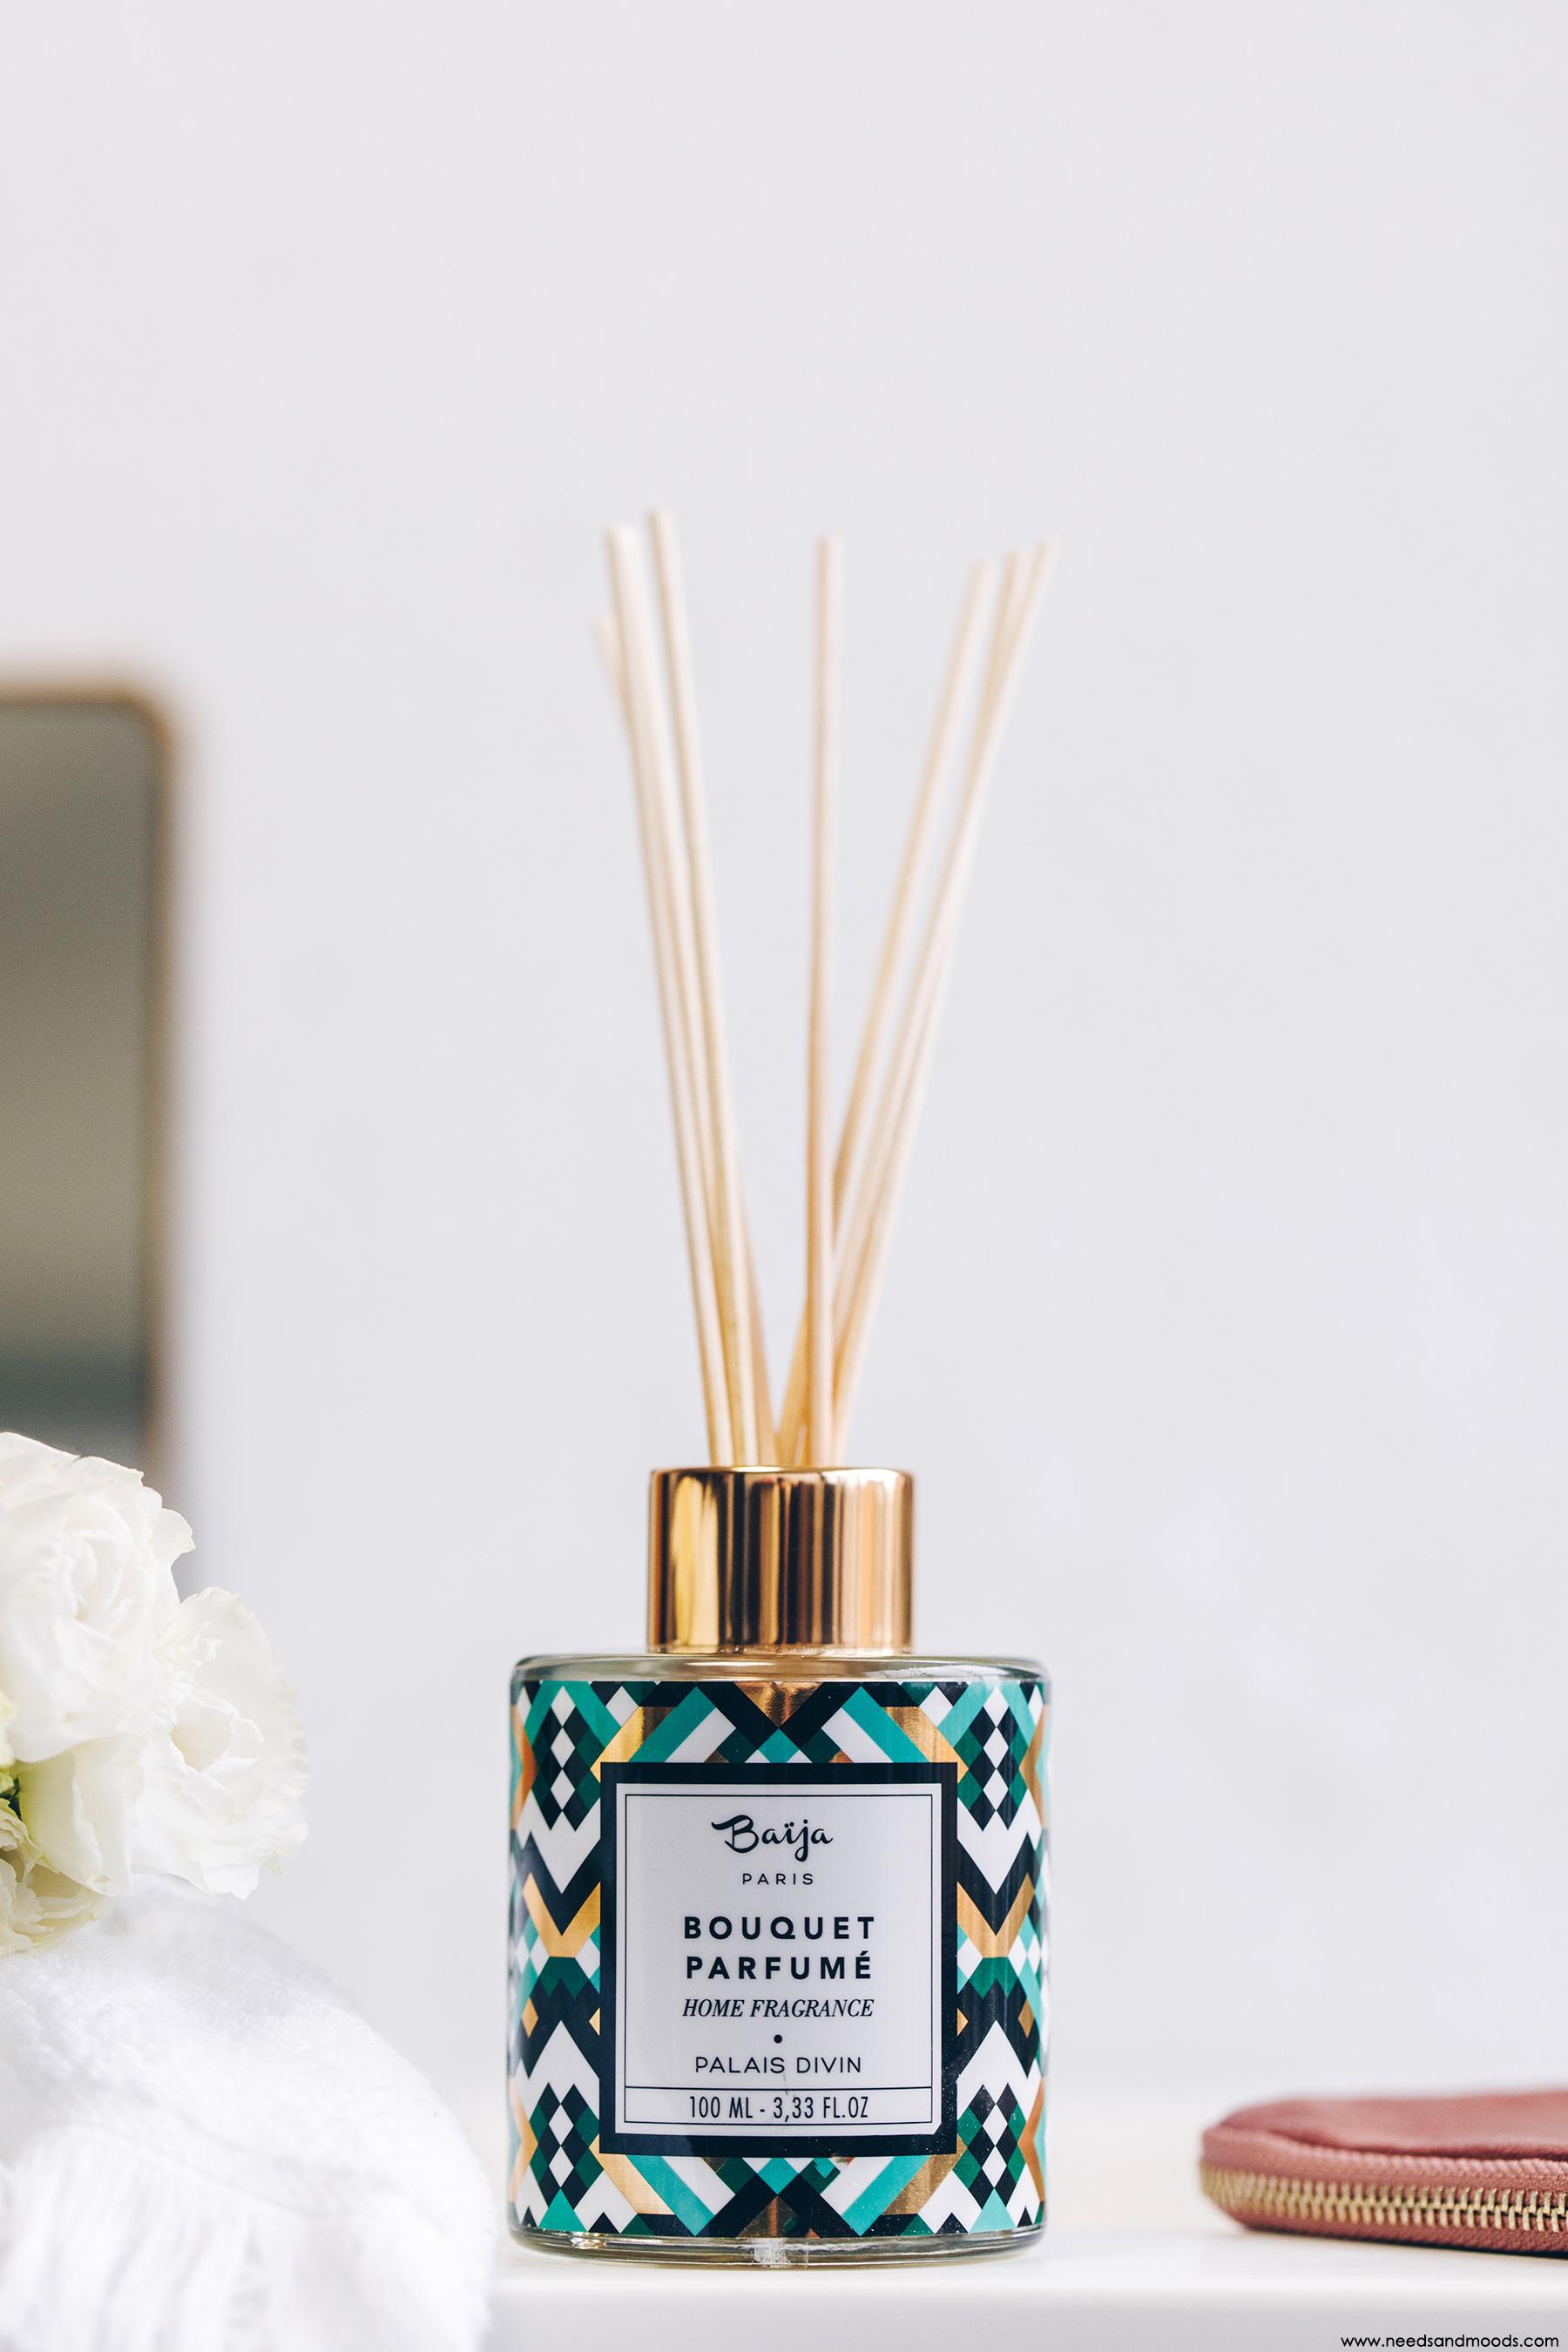 baija palais divin bouquet parfume